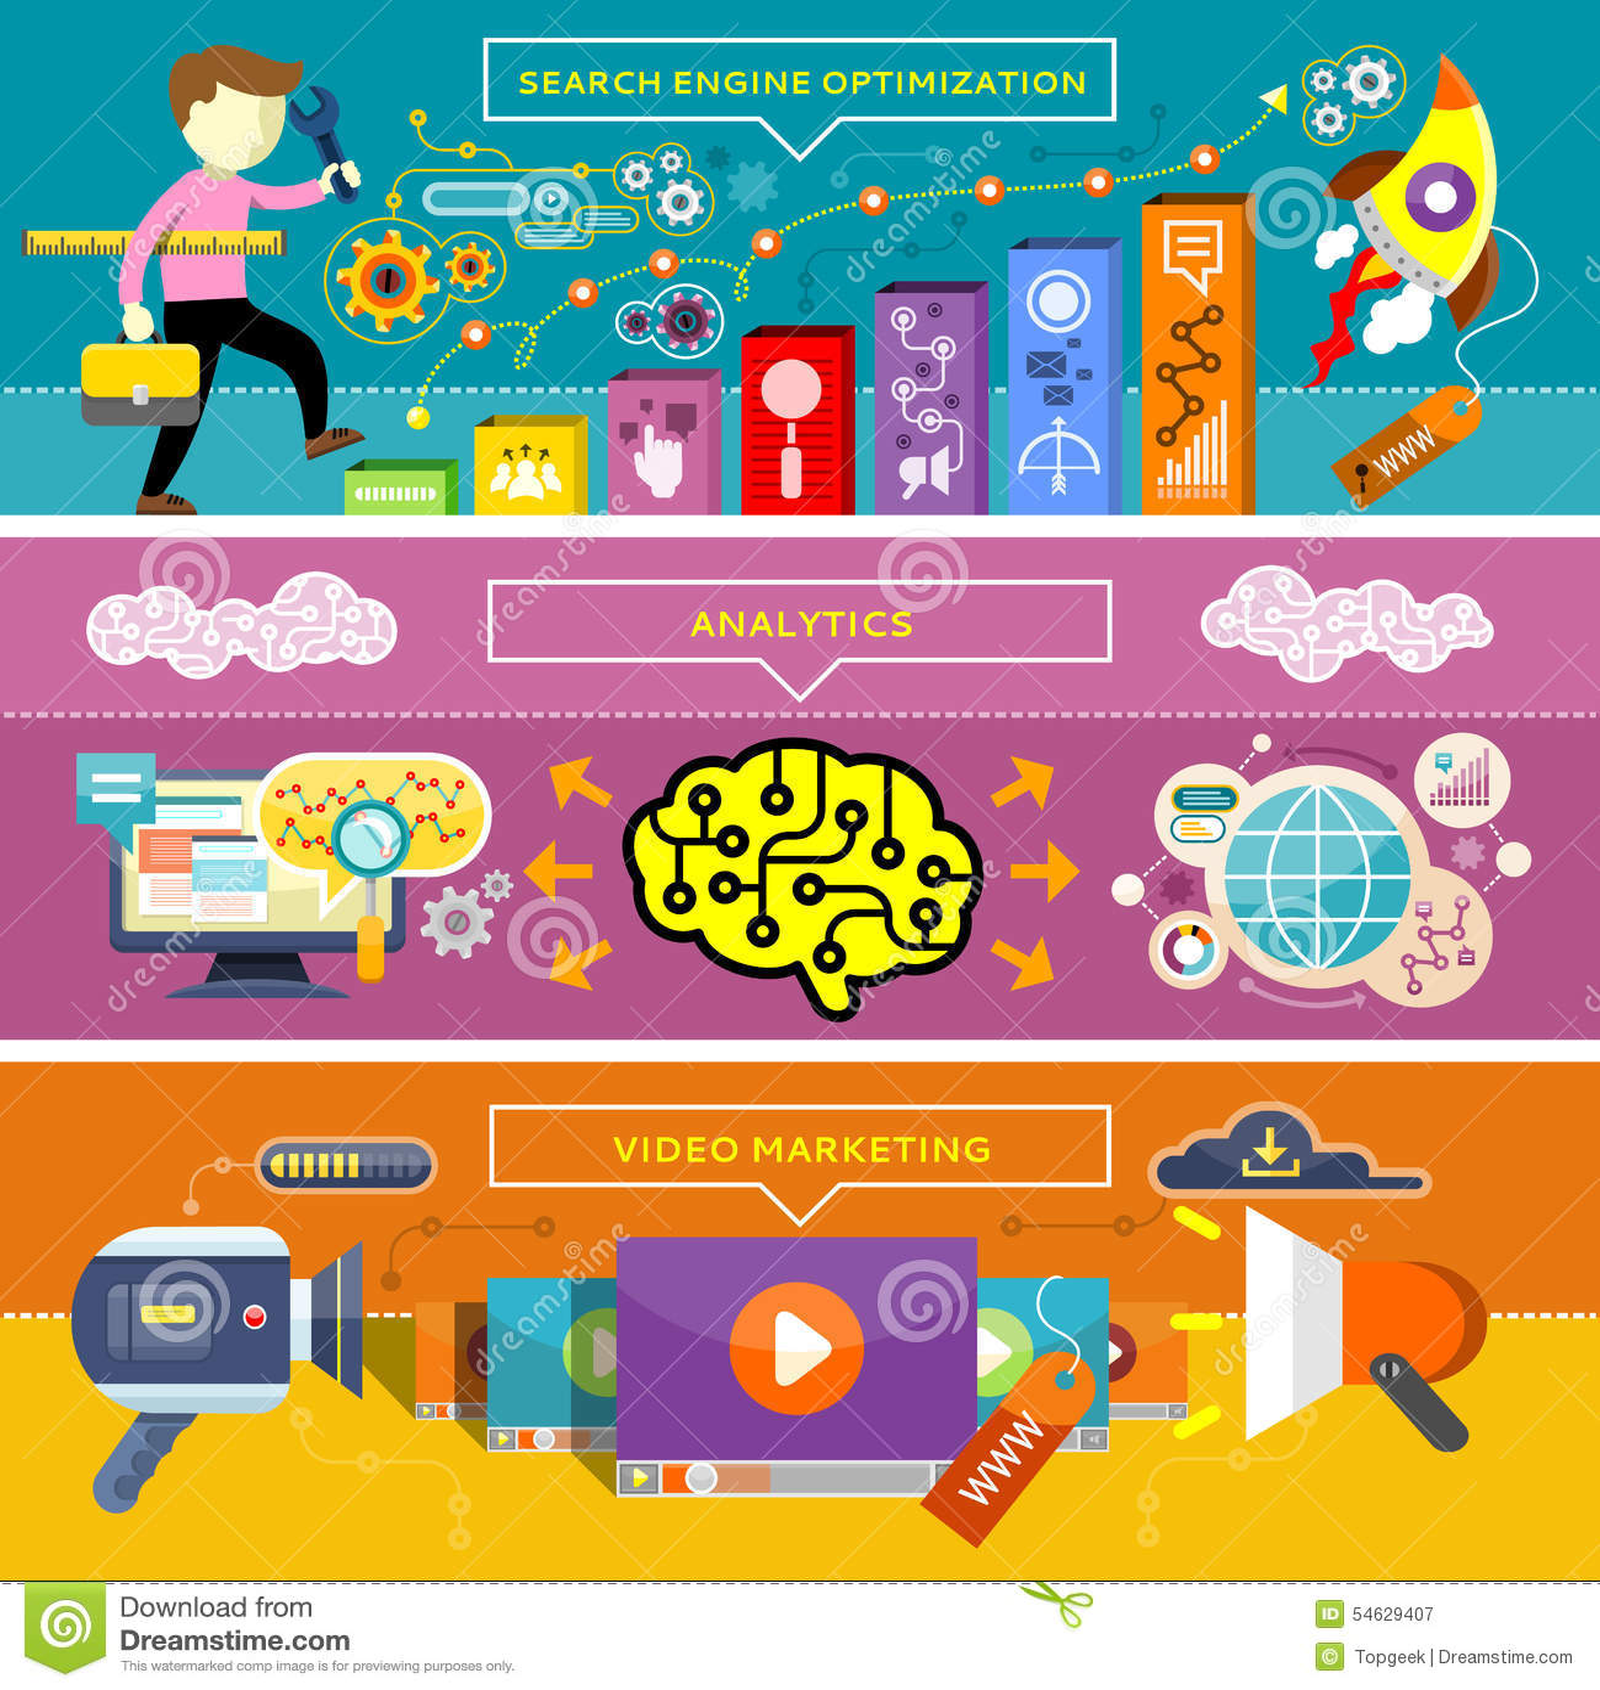 Analytics, SEO Optimization and Video Marketing